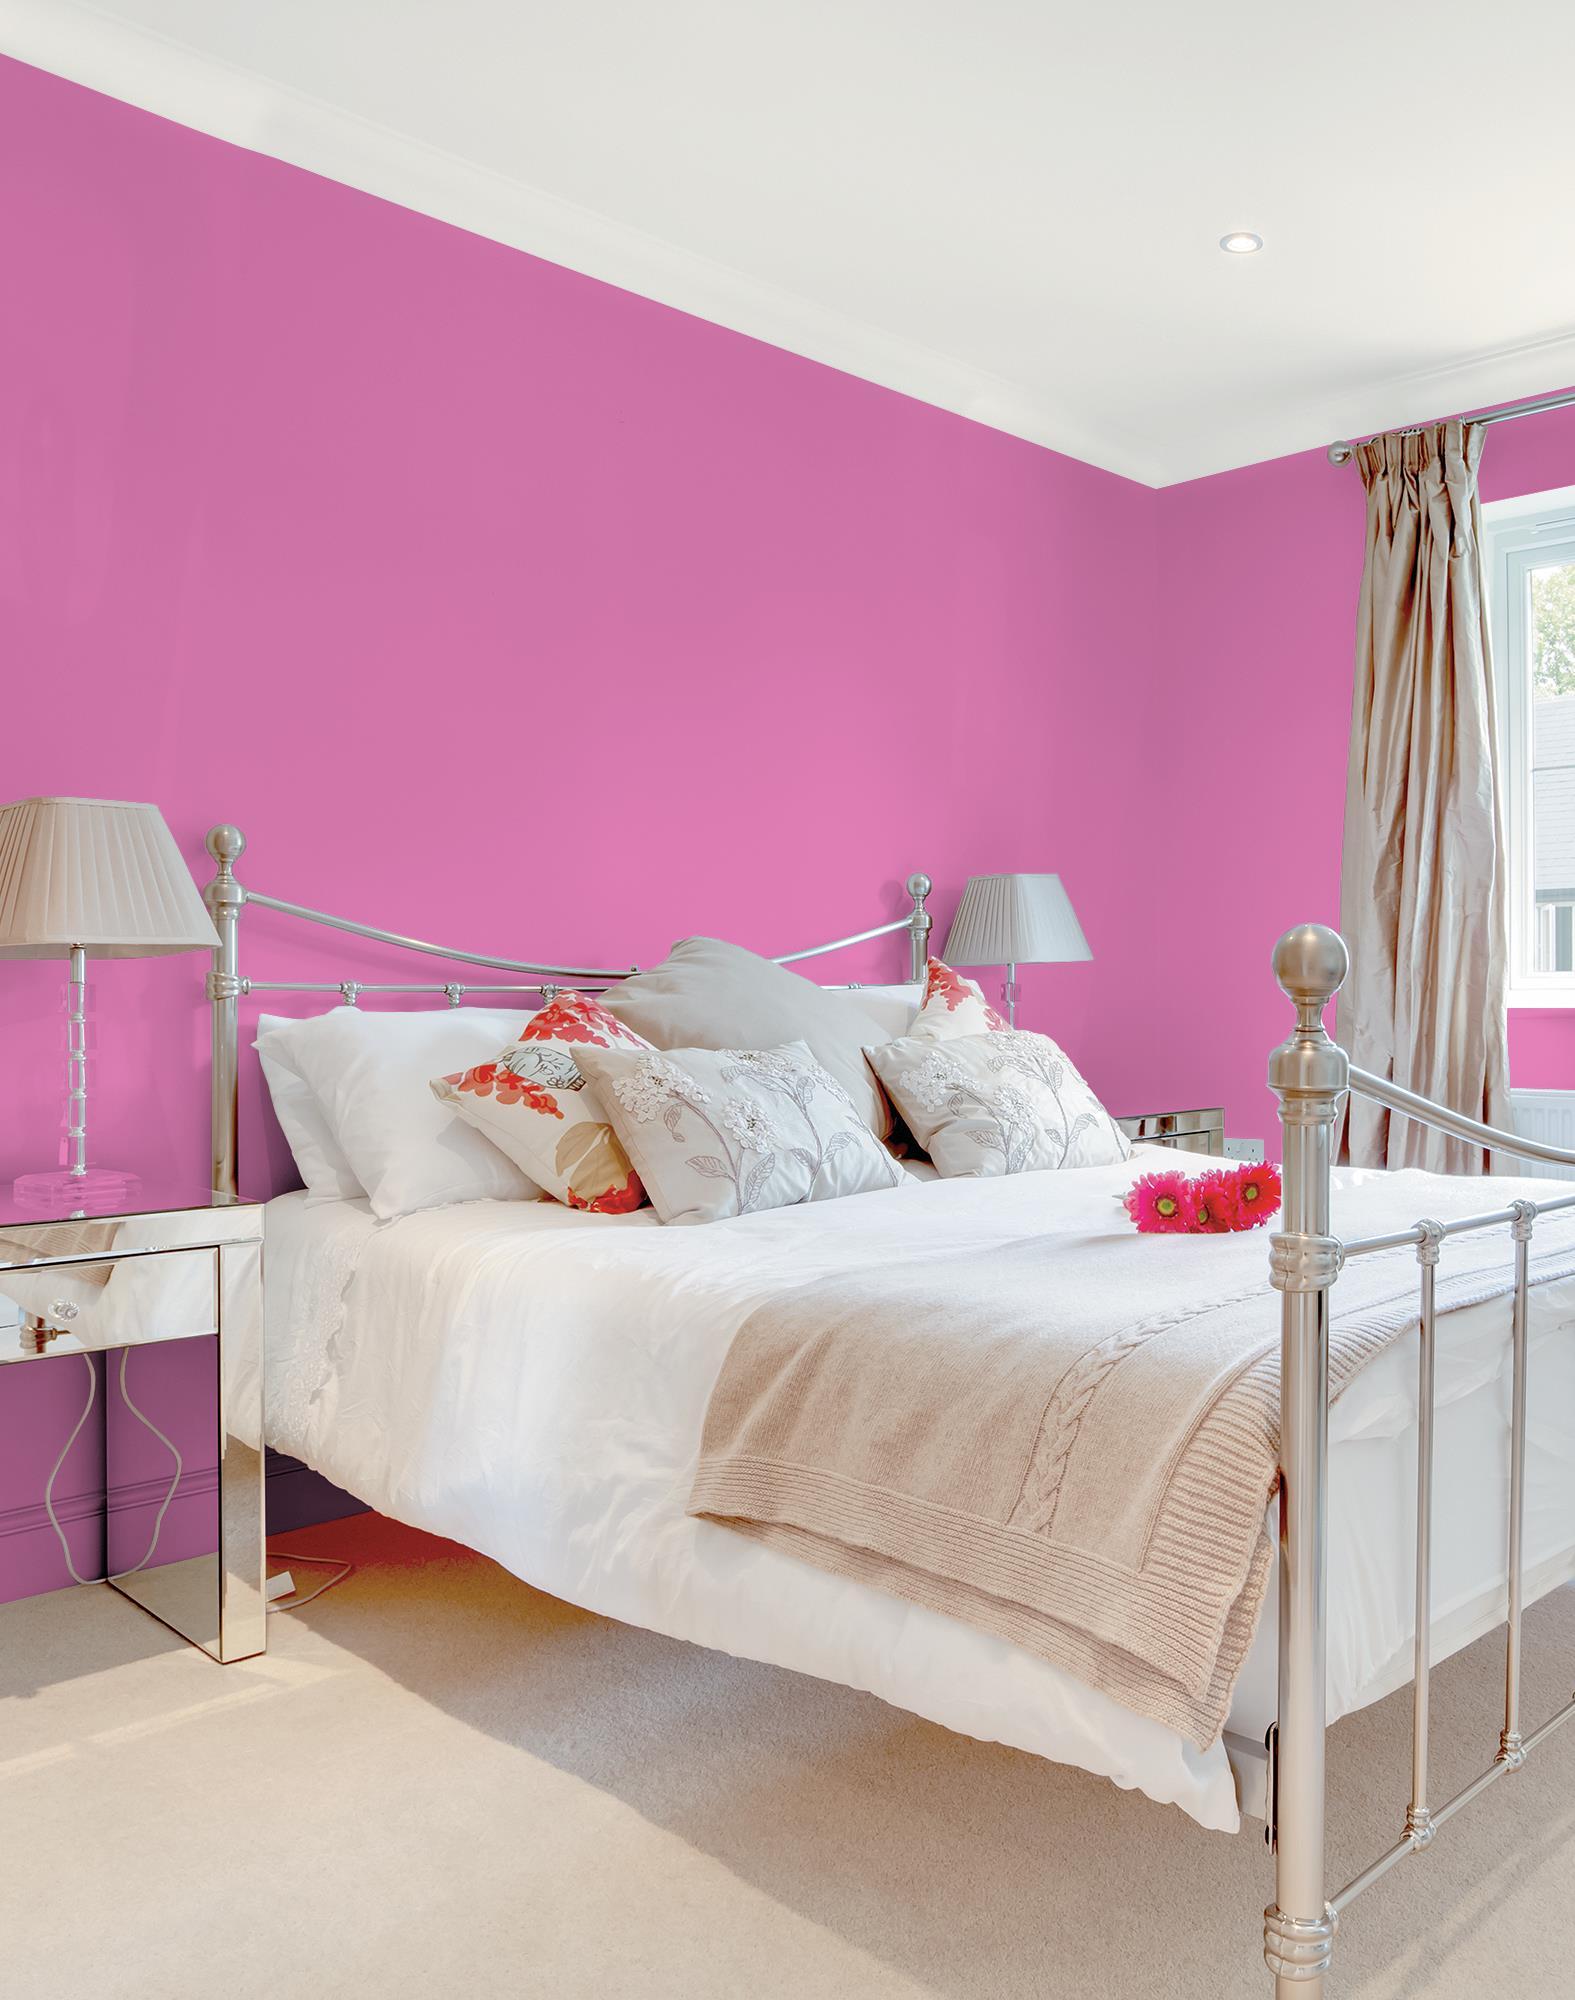 Passion Pink 206,116,167